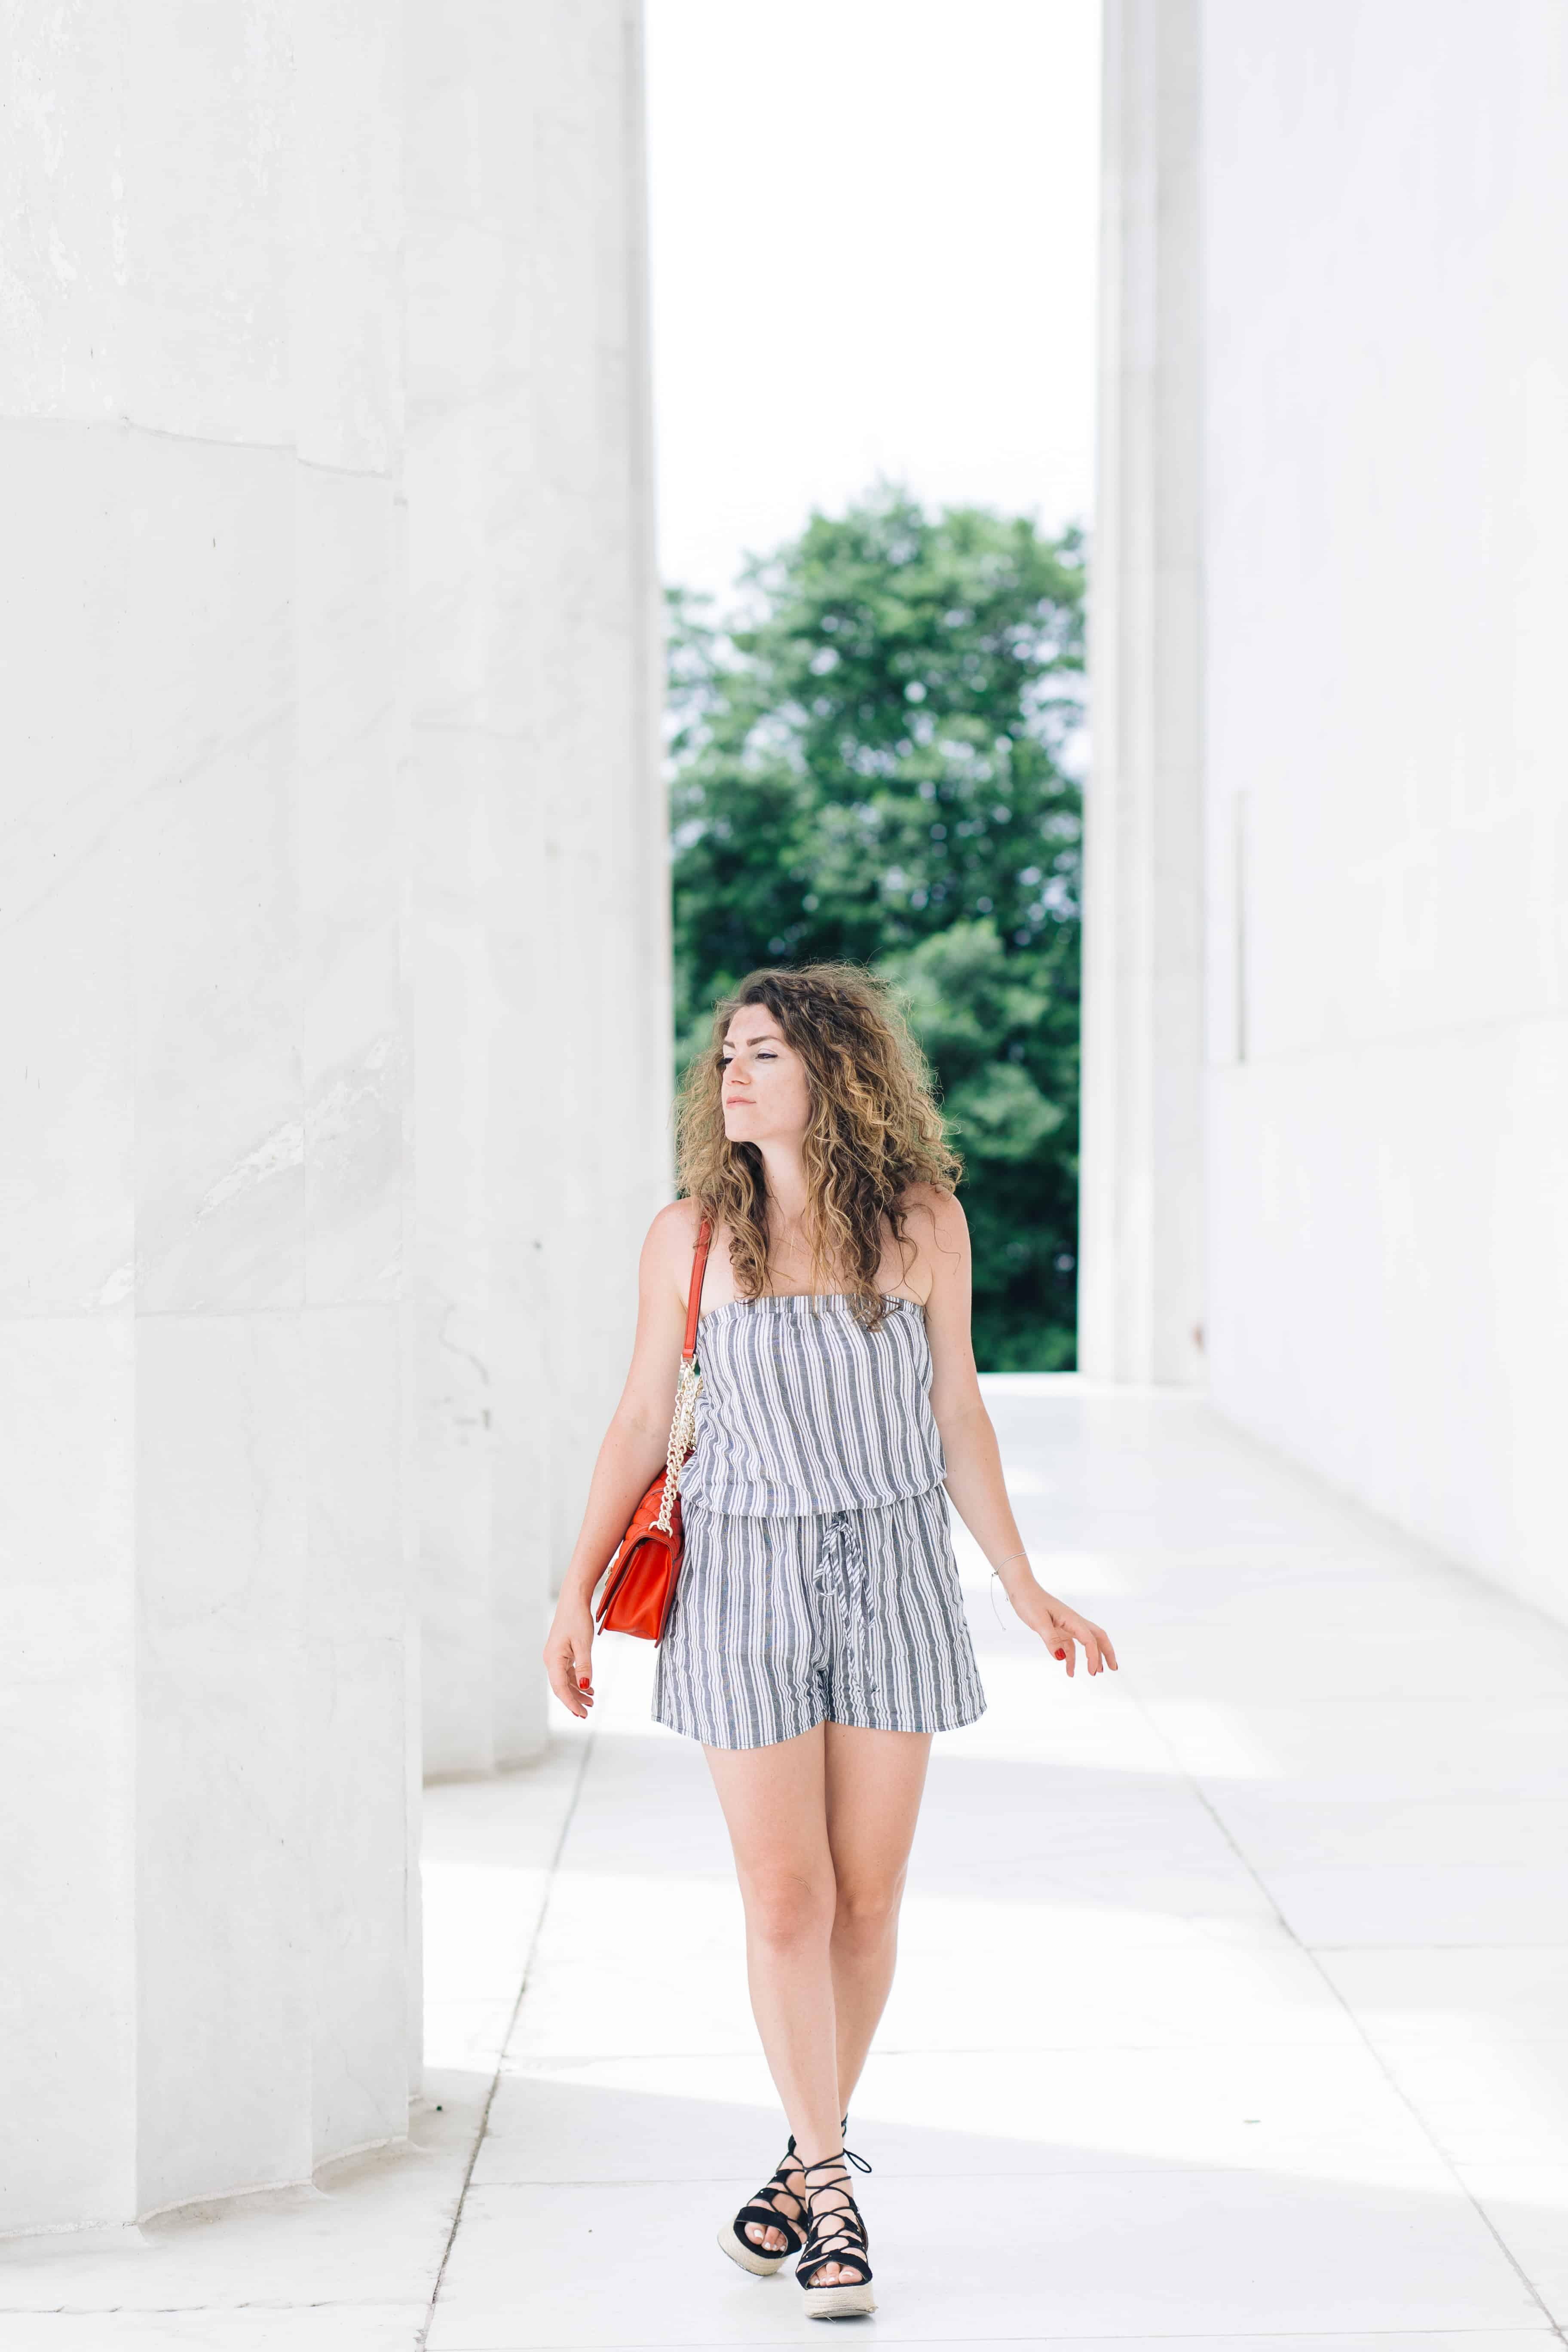 Summer Chic: Striped Romper Silver Jewelry